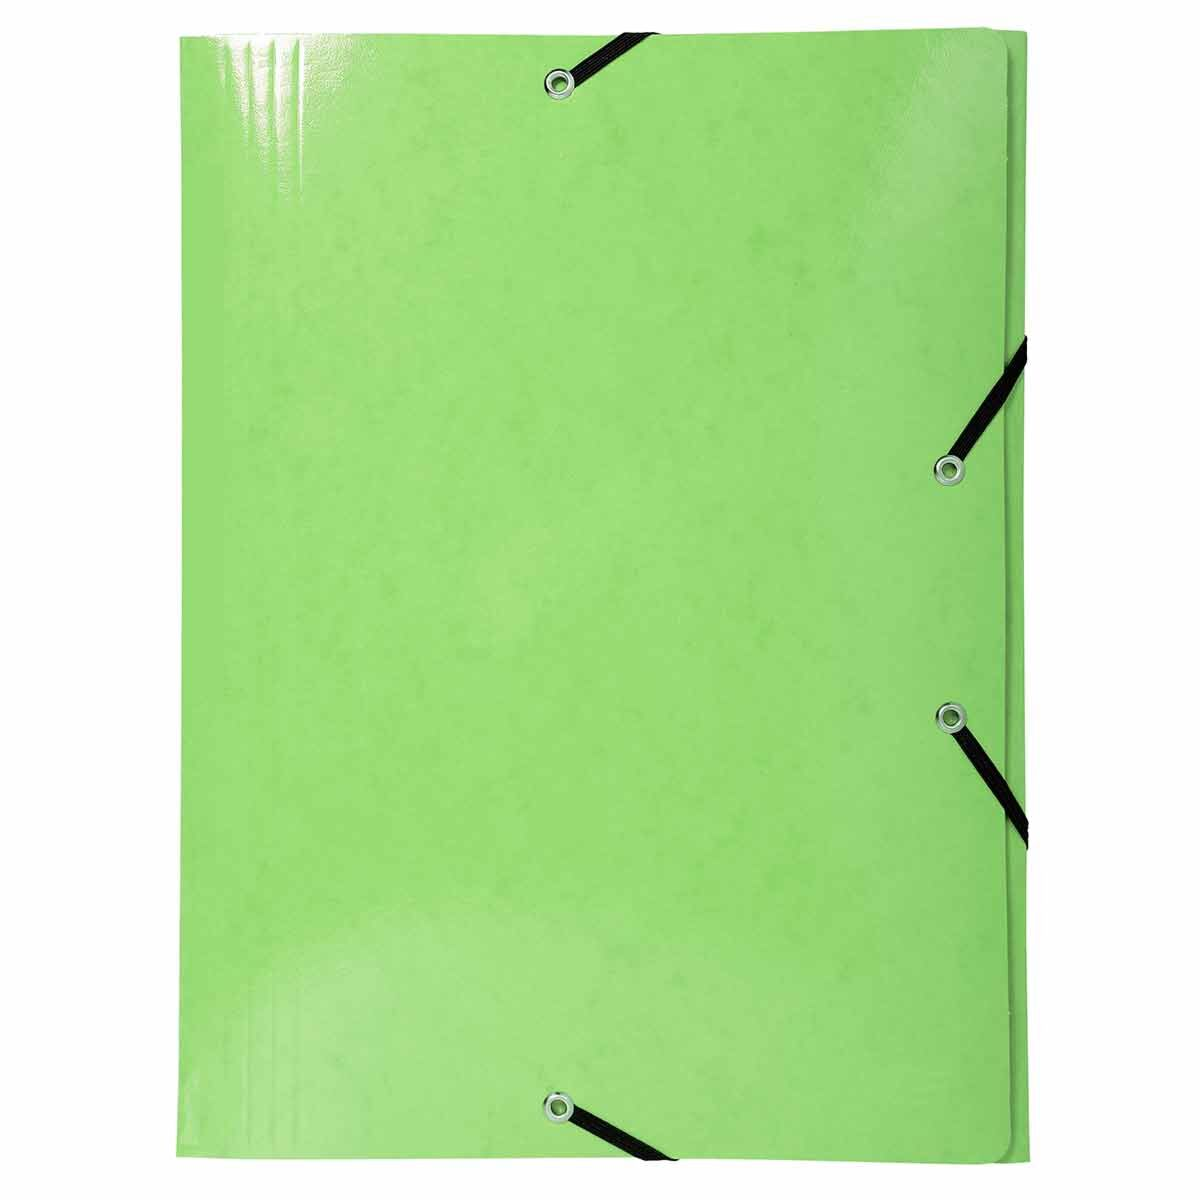 Exacompta Iderama Elasticated 3 Flap Folder A3 590gsm Pack of 5